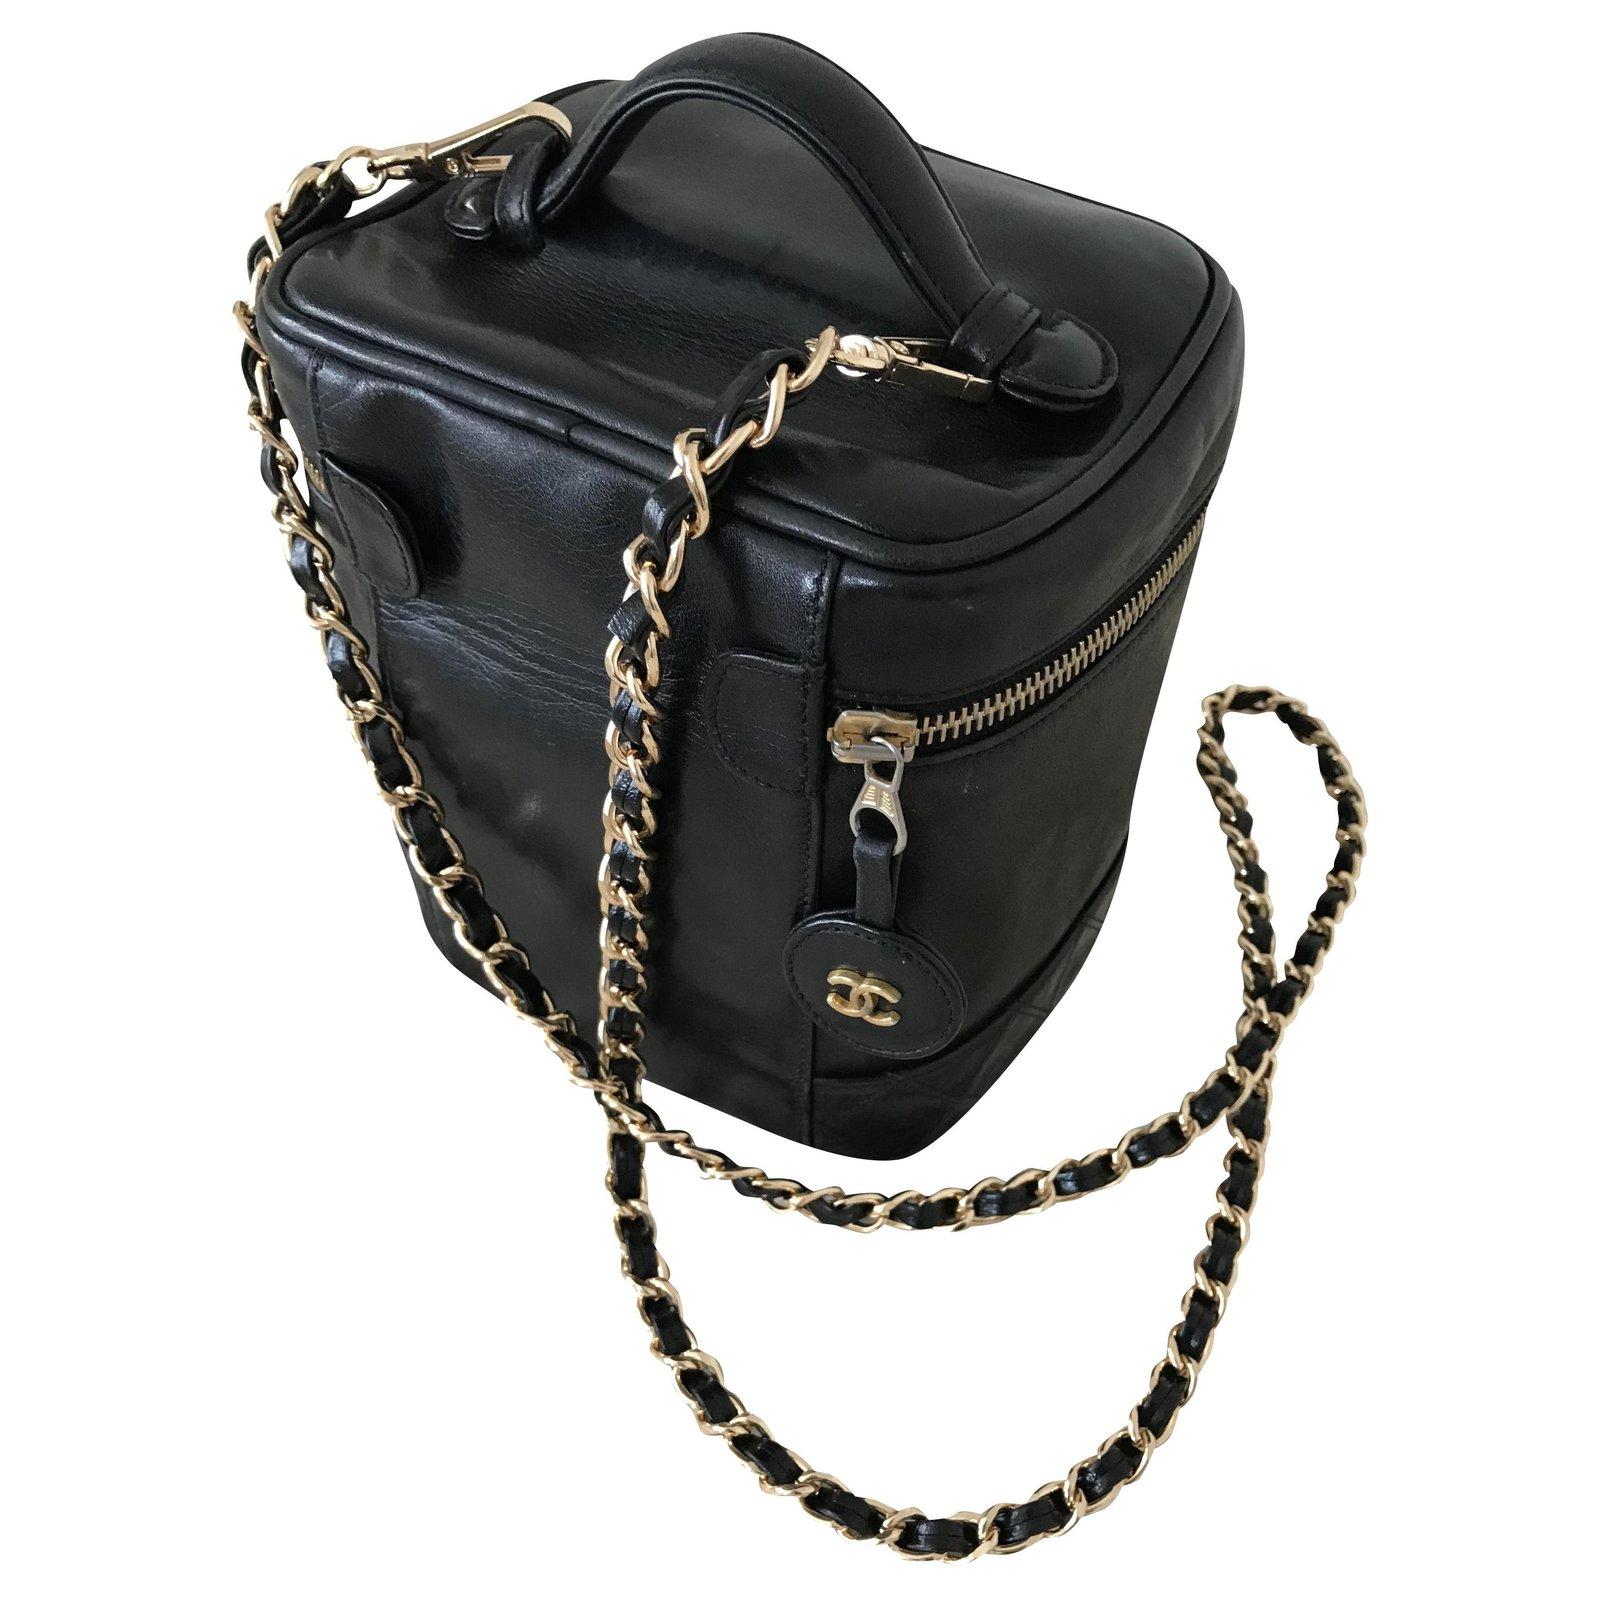 Chanel Vintage Vanity Handbags Leather Black Ref 227013 Joli Closet